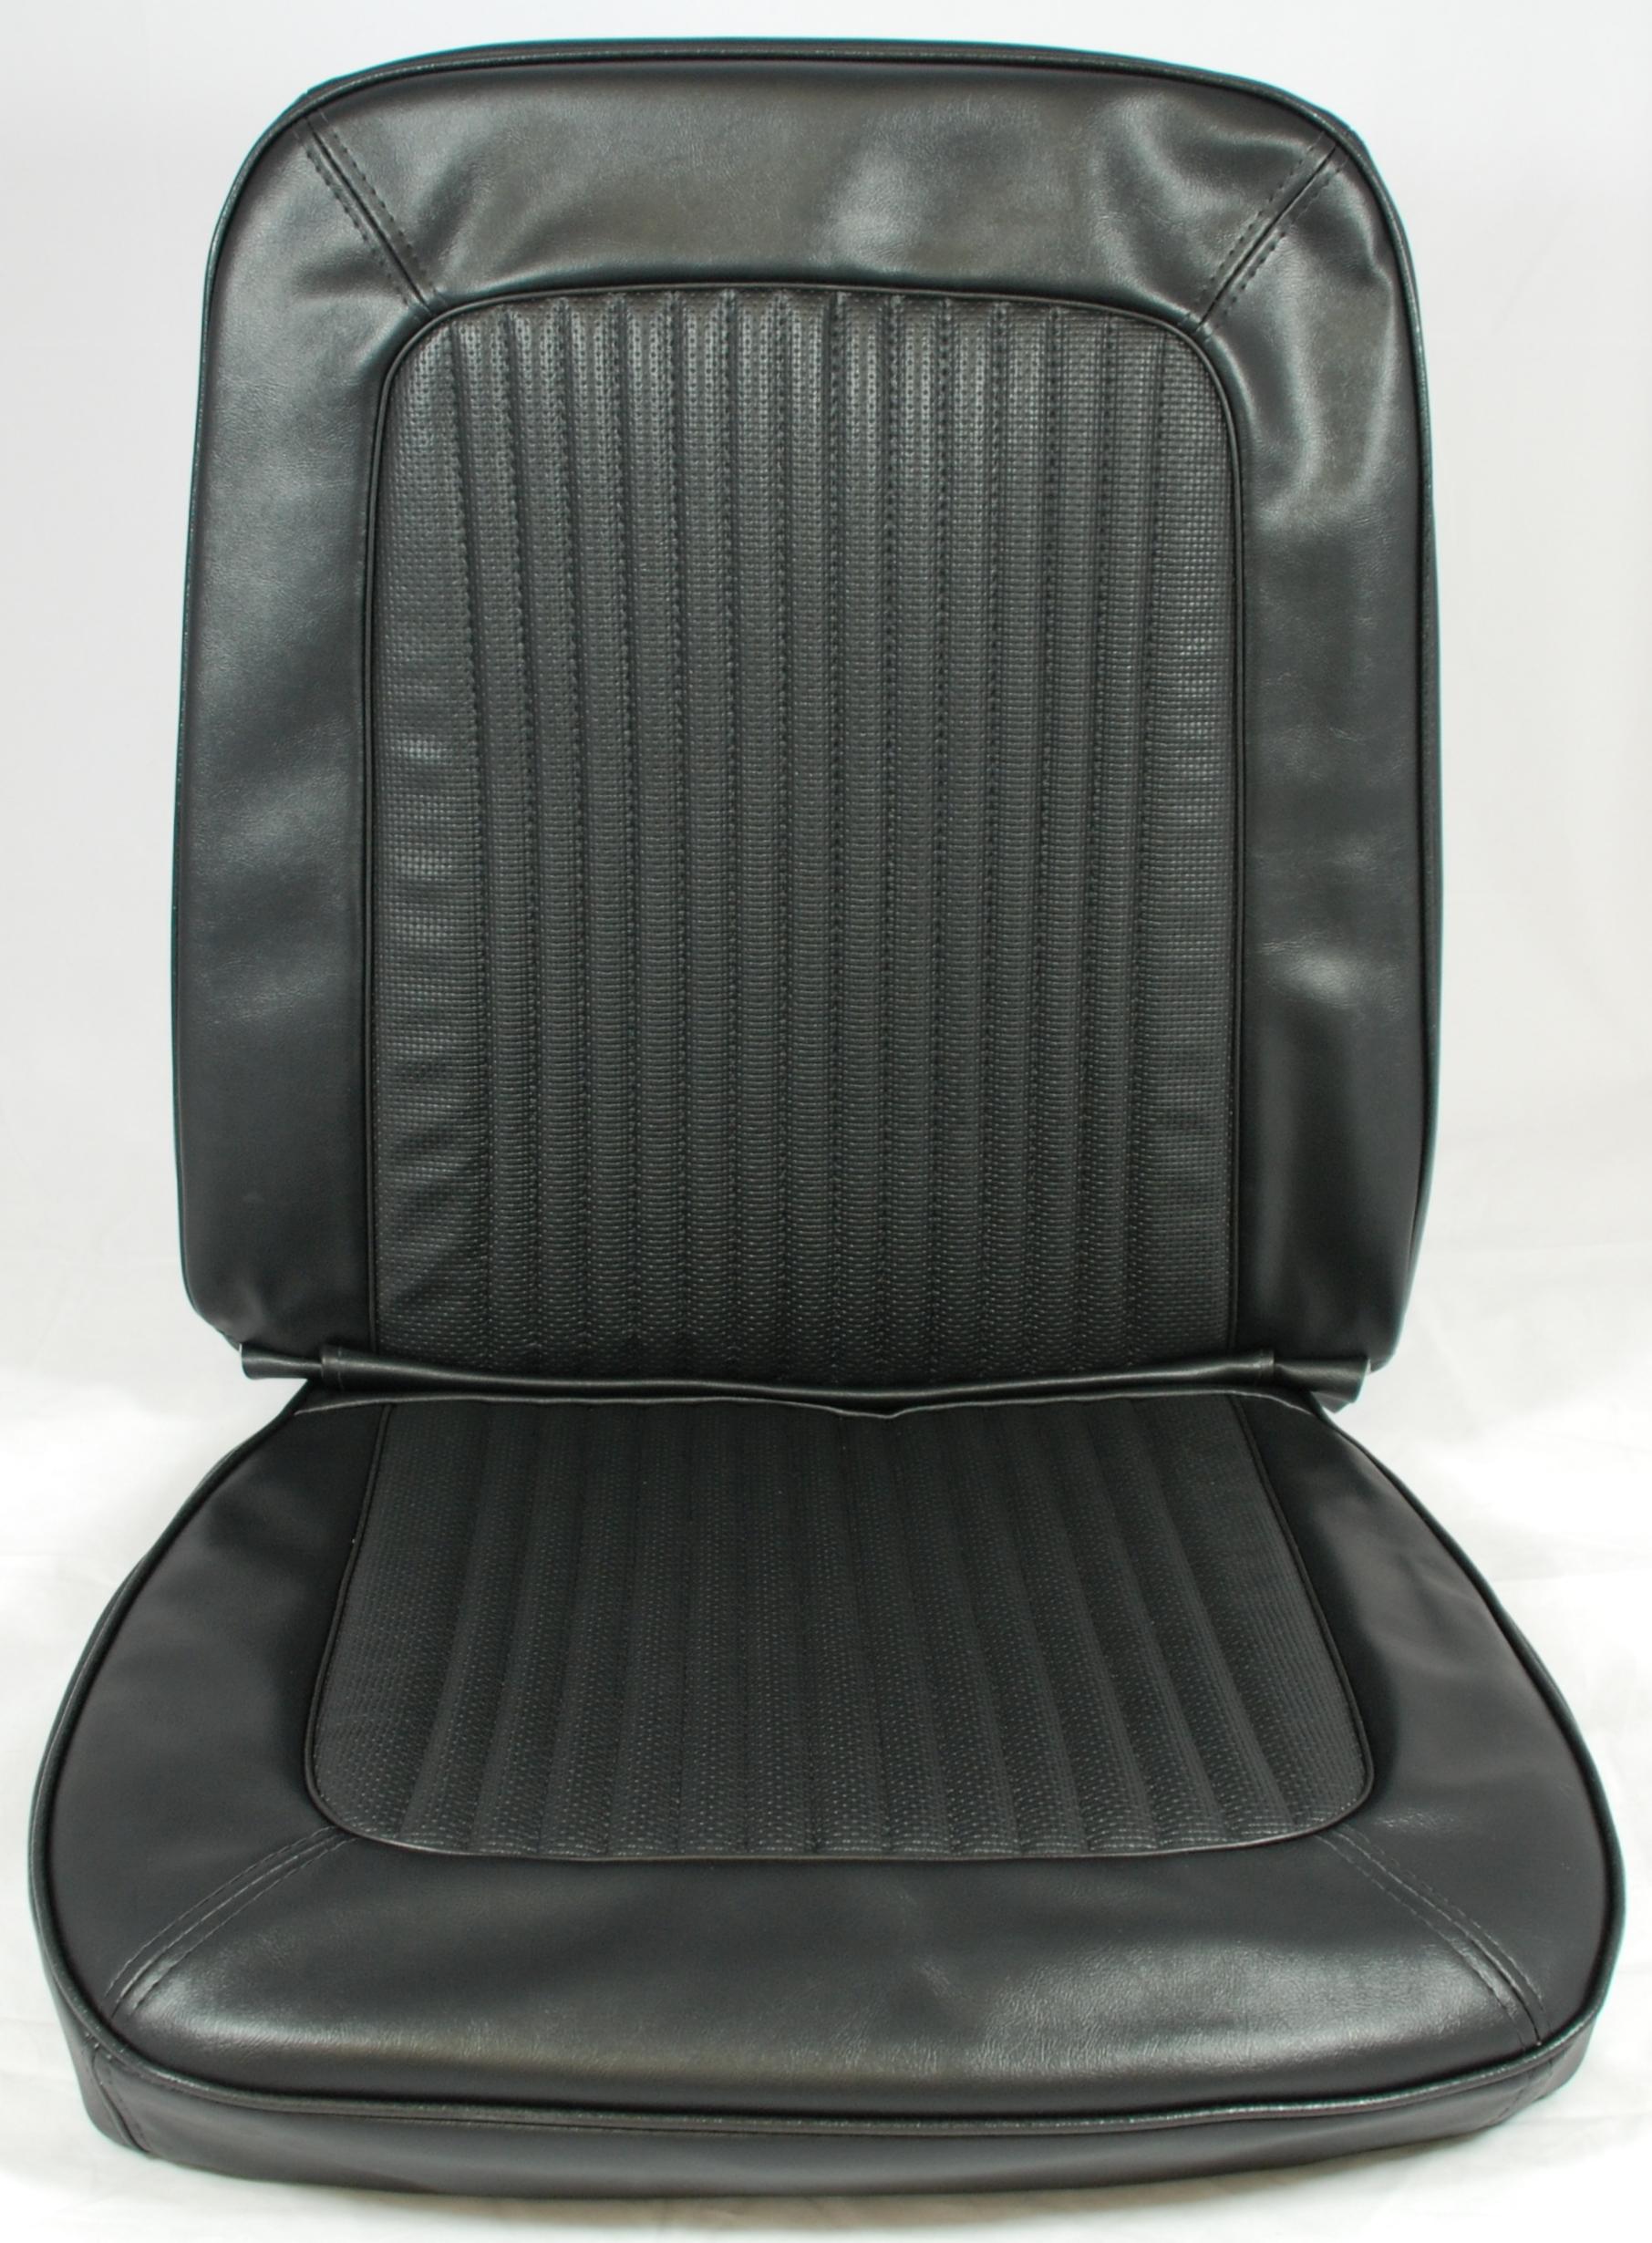 1968 1977 Bronco Upholstery